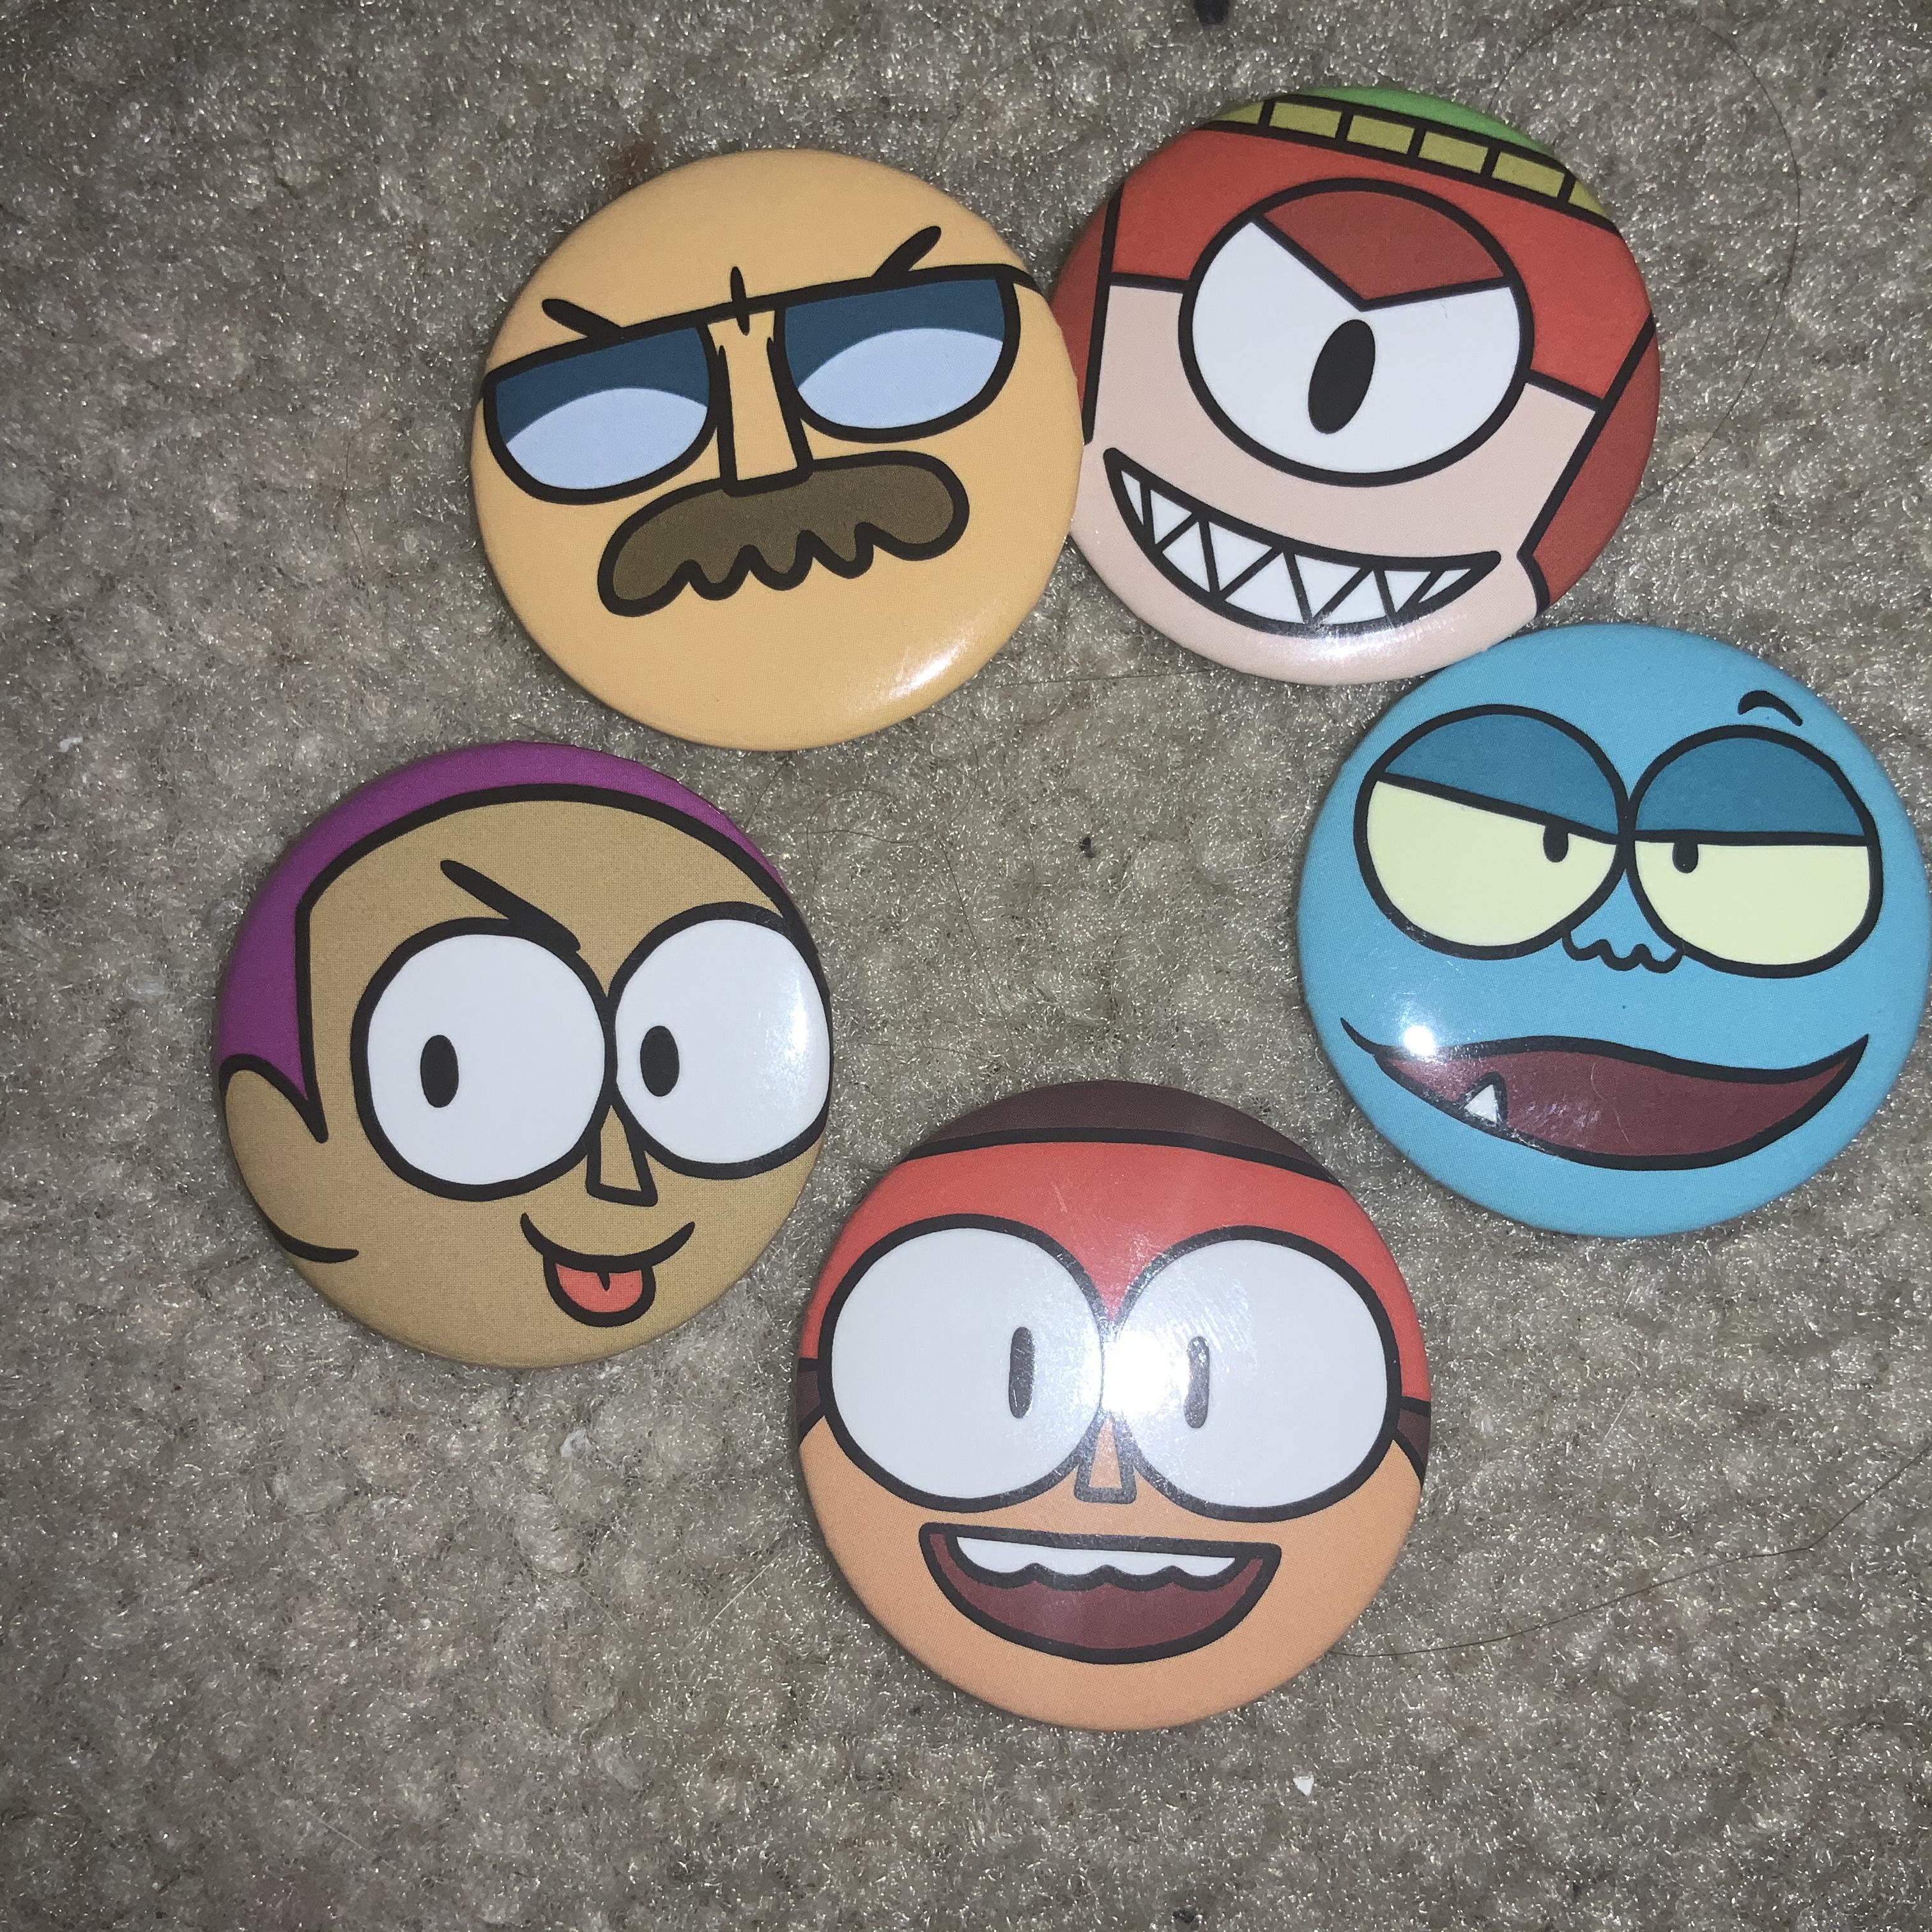 OK K.O. Buttons